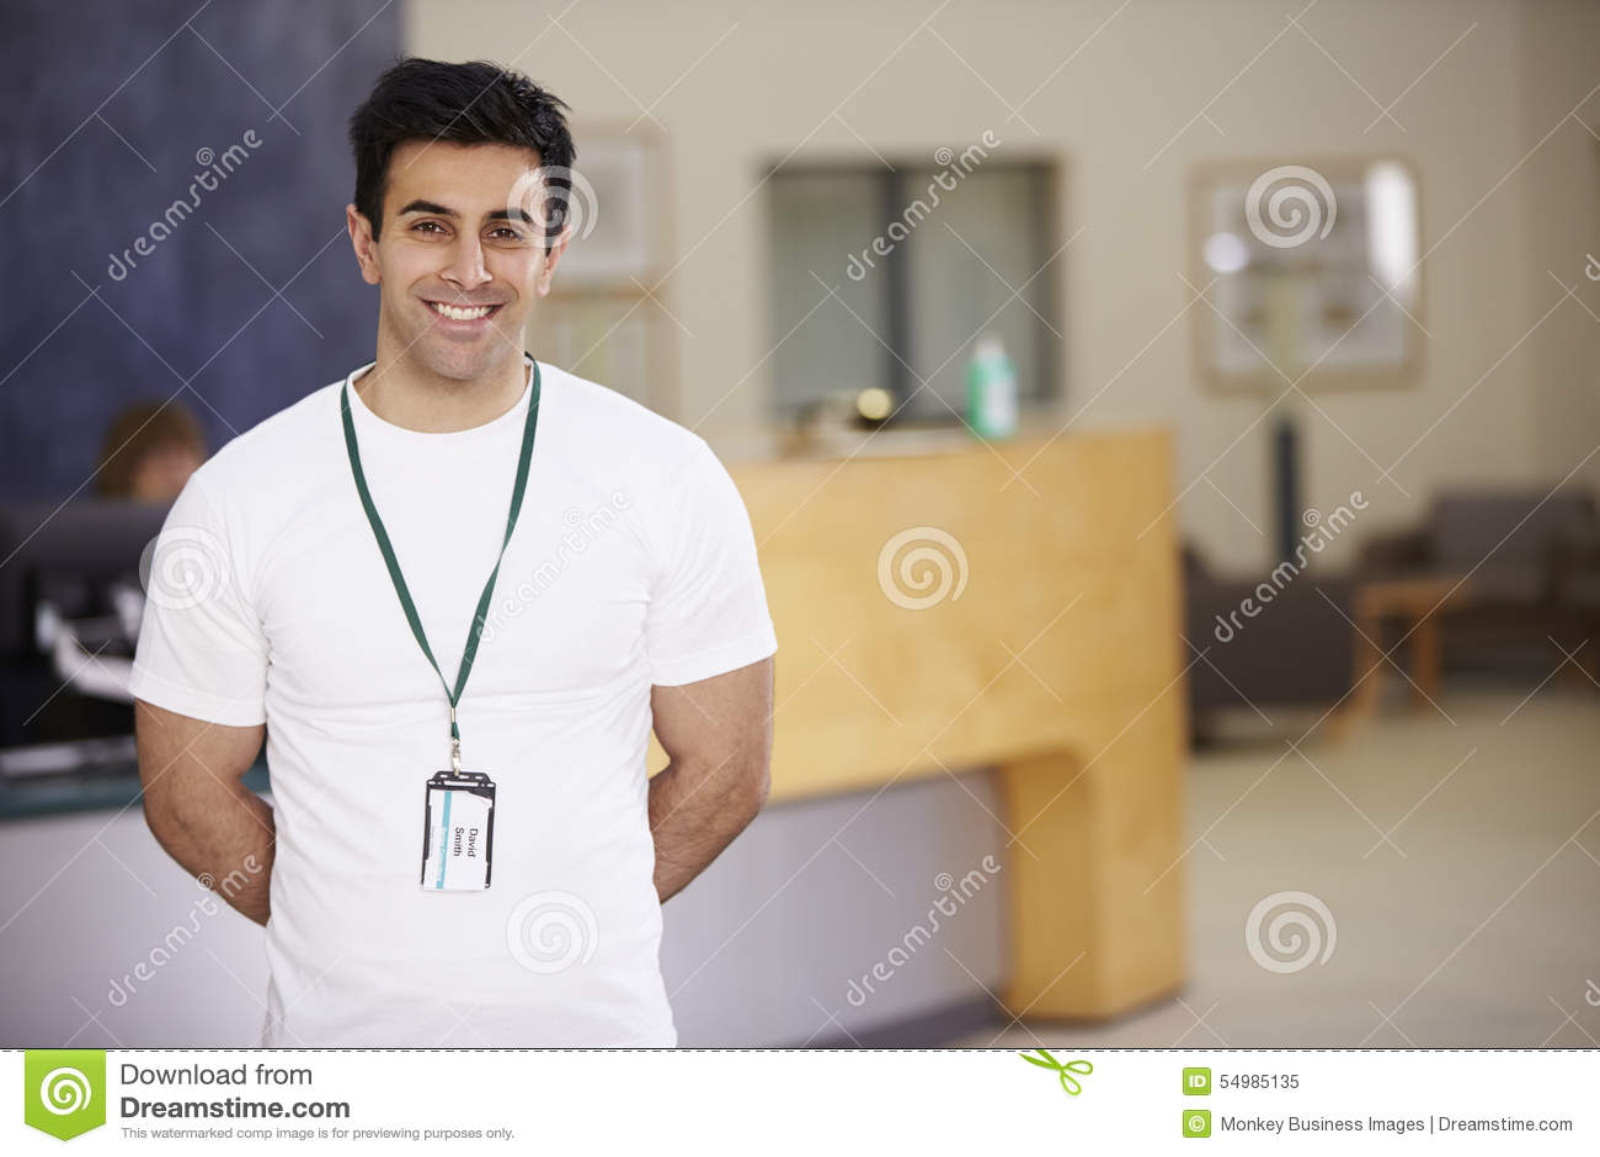 Portret van Mannelijke Fysiotherapeut In Hospital Reception